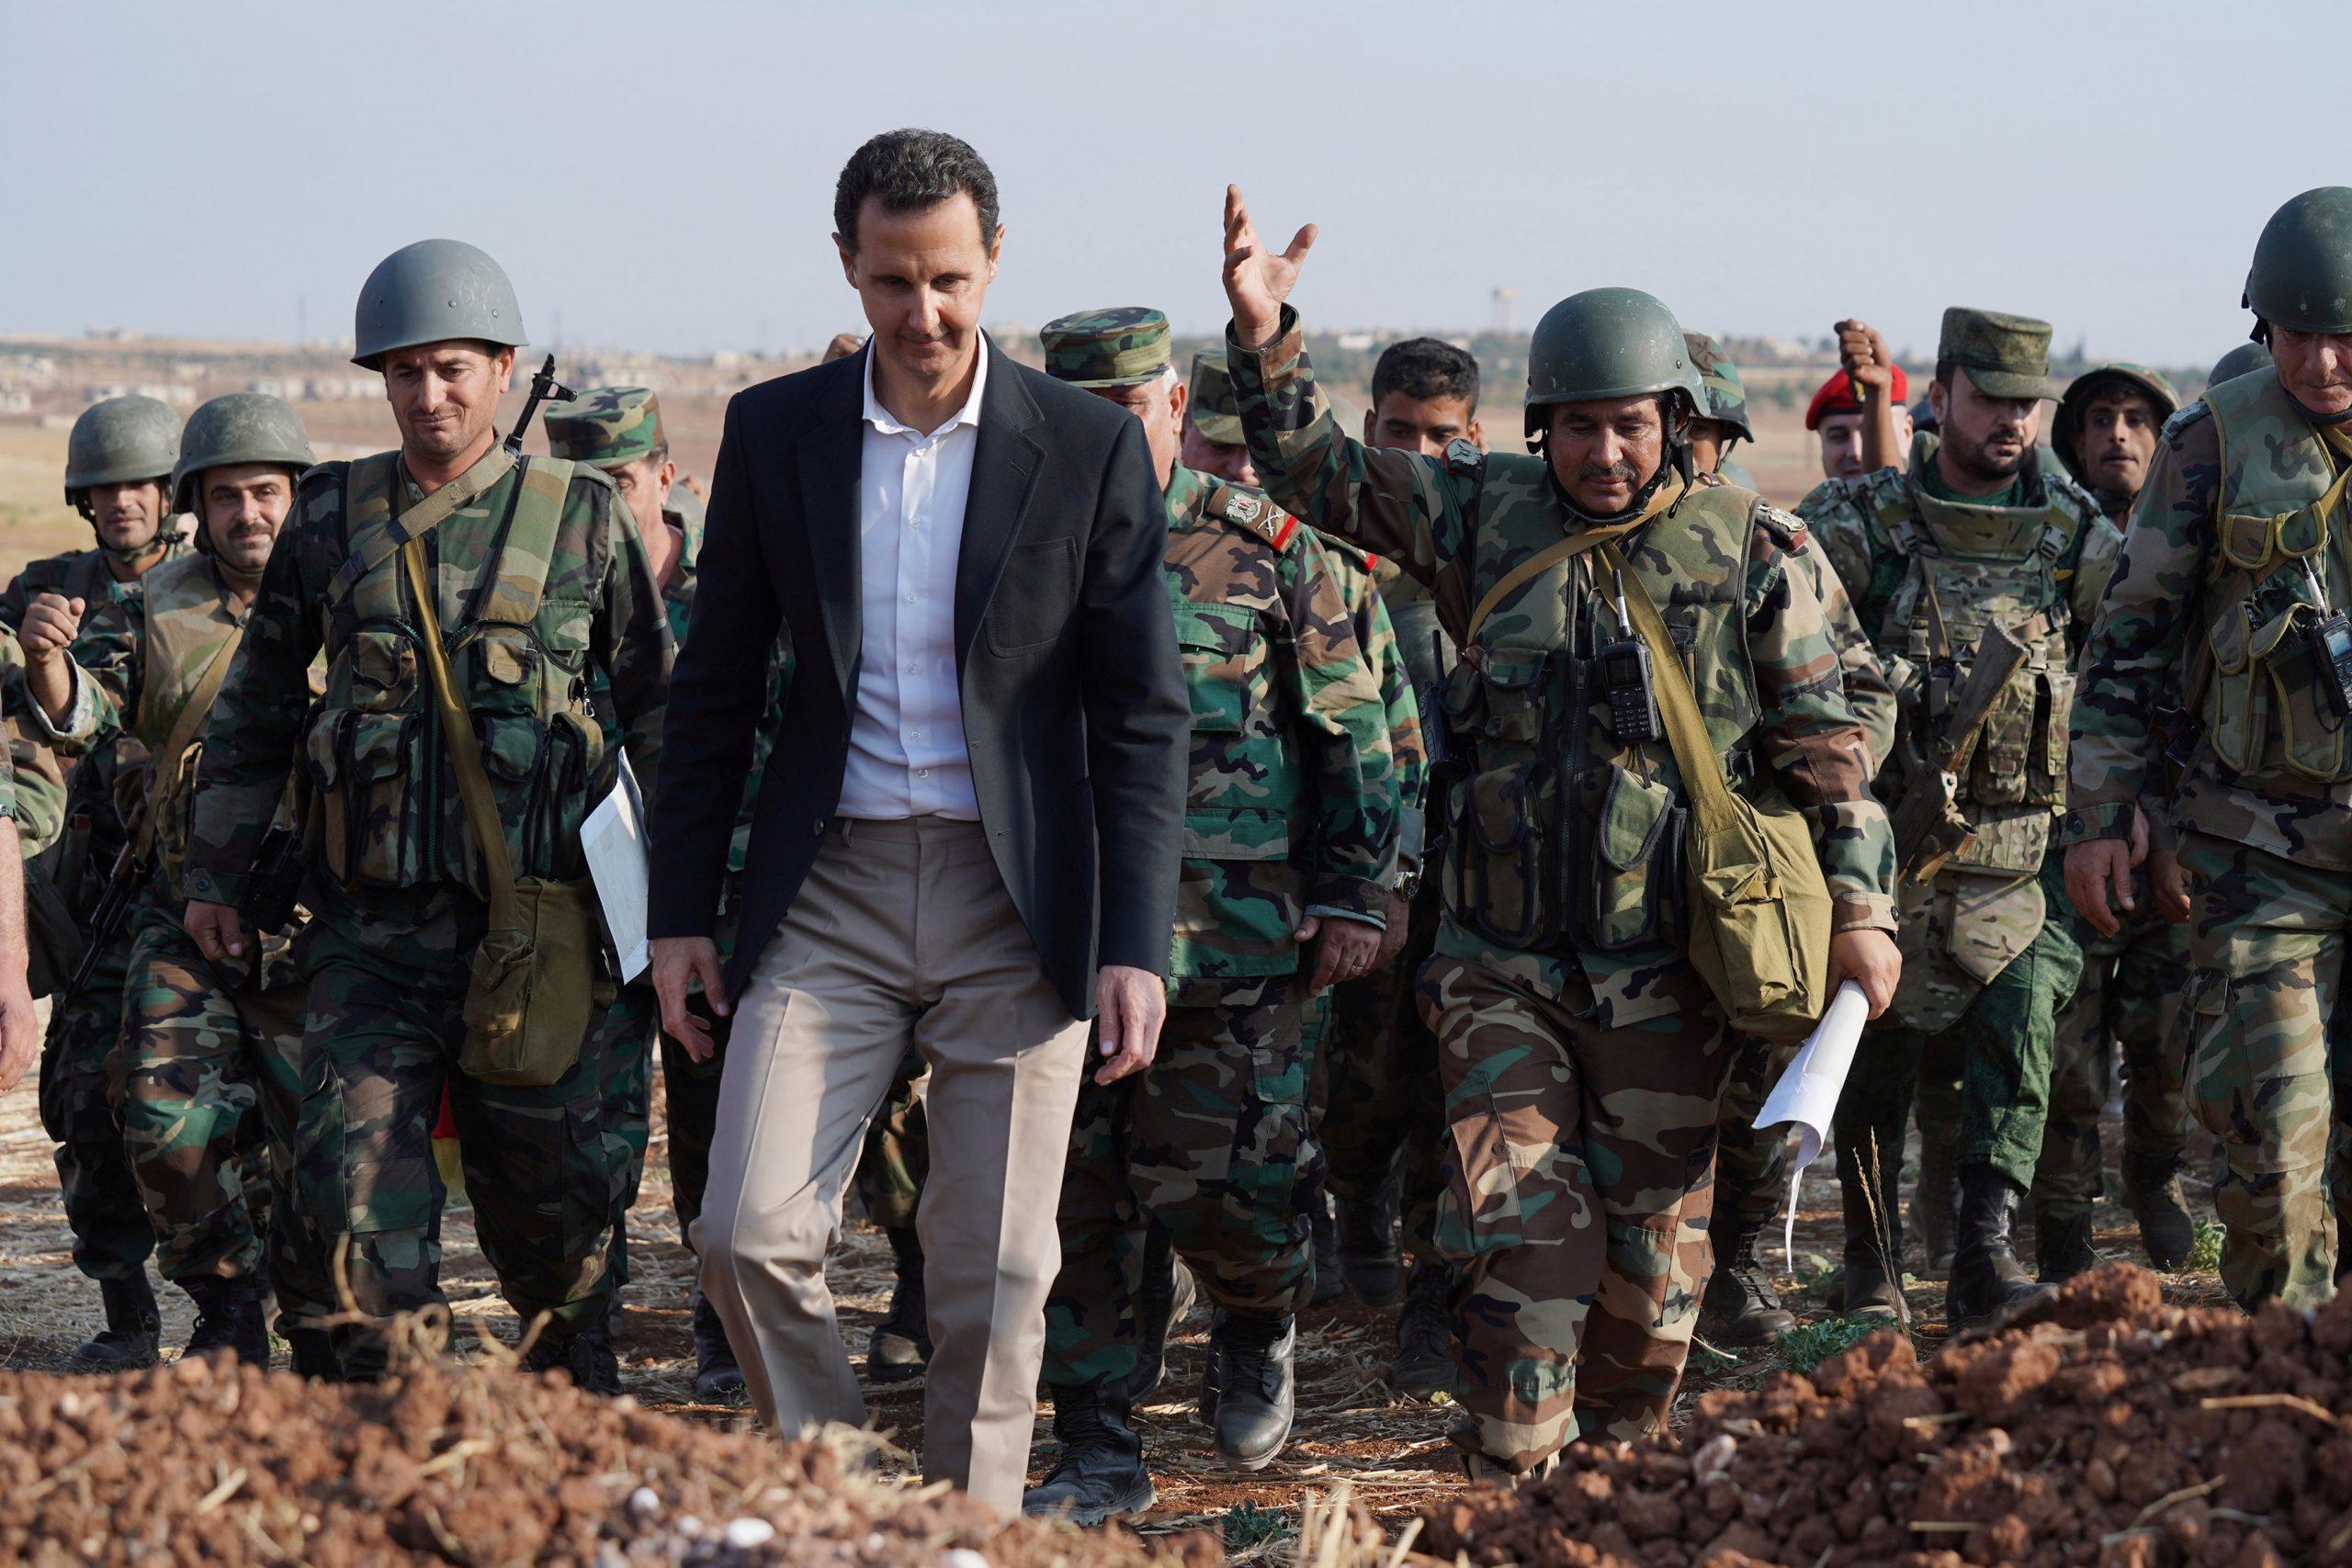 Bashar al-Assad et al. standing in front of a military uniform